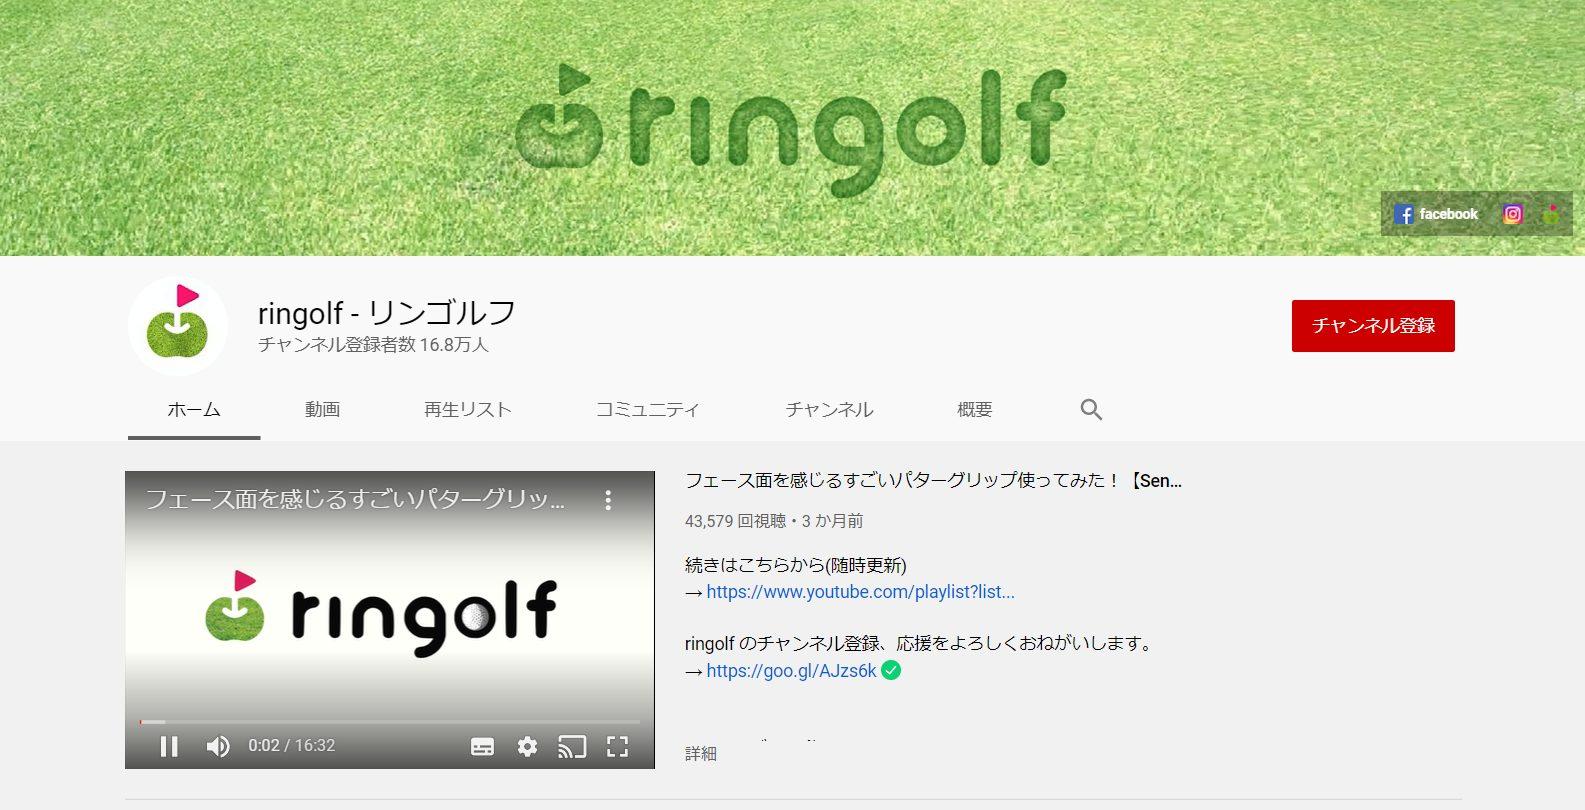 youtube-sports-influencer-ringolf